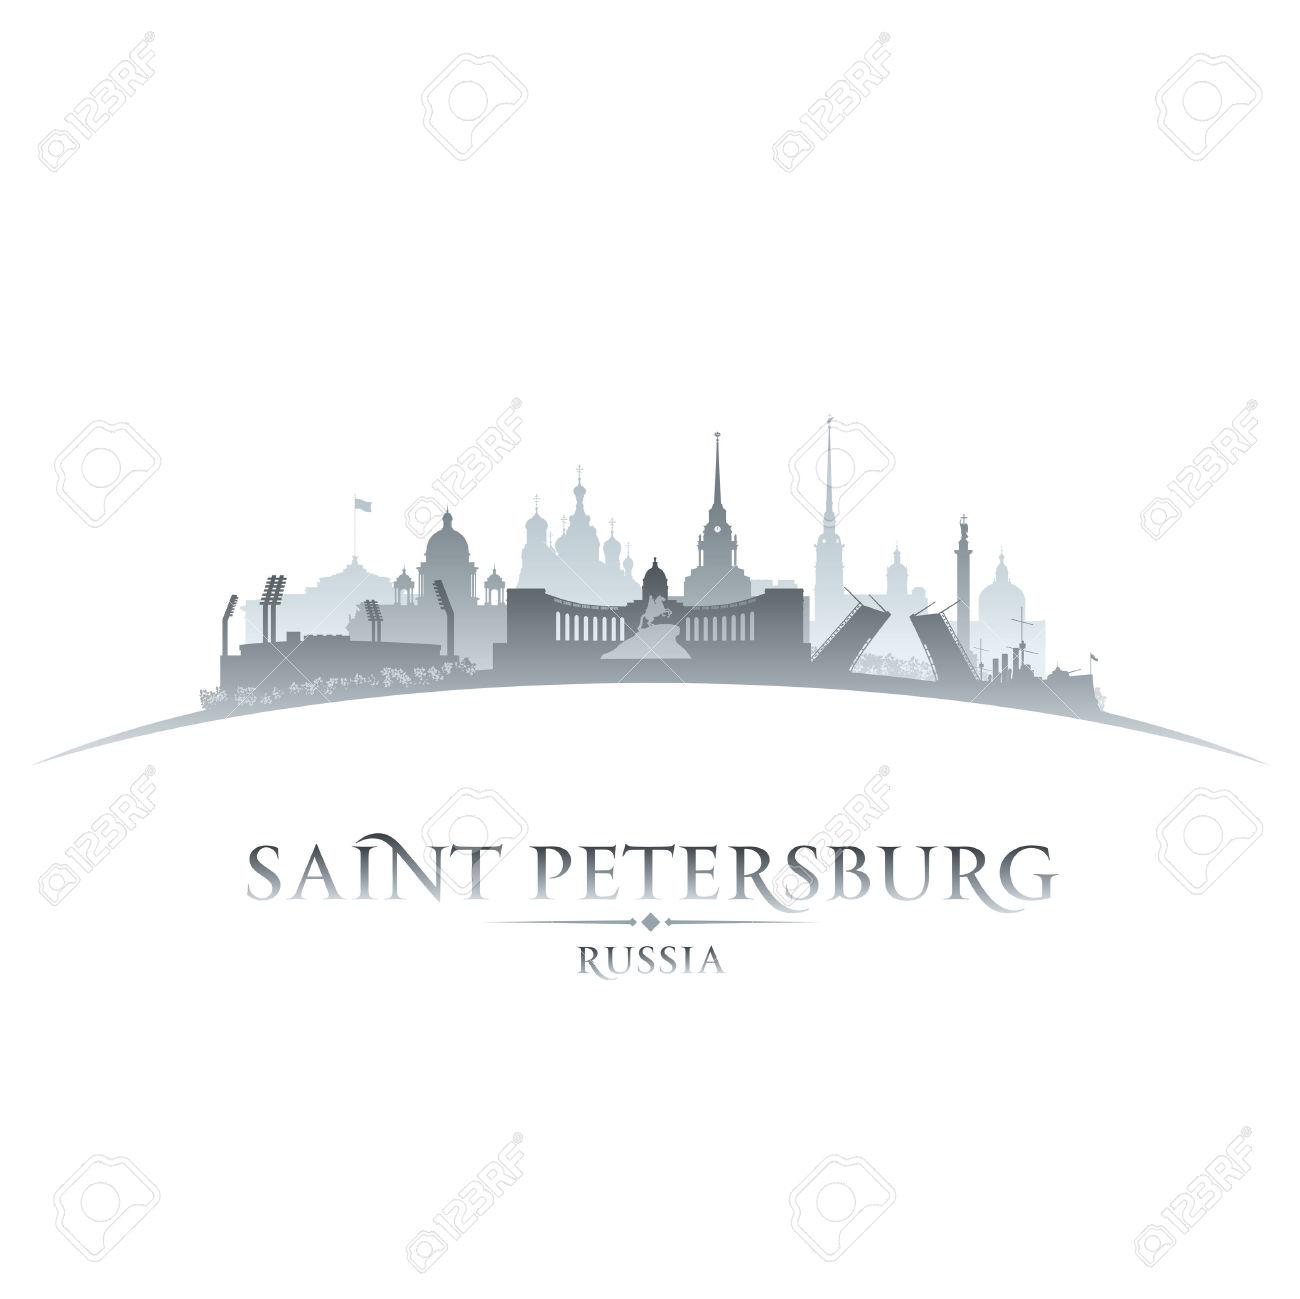 Saint Petersburg Russia City Skyline Silhouette. Vector.